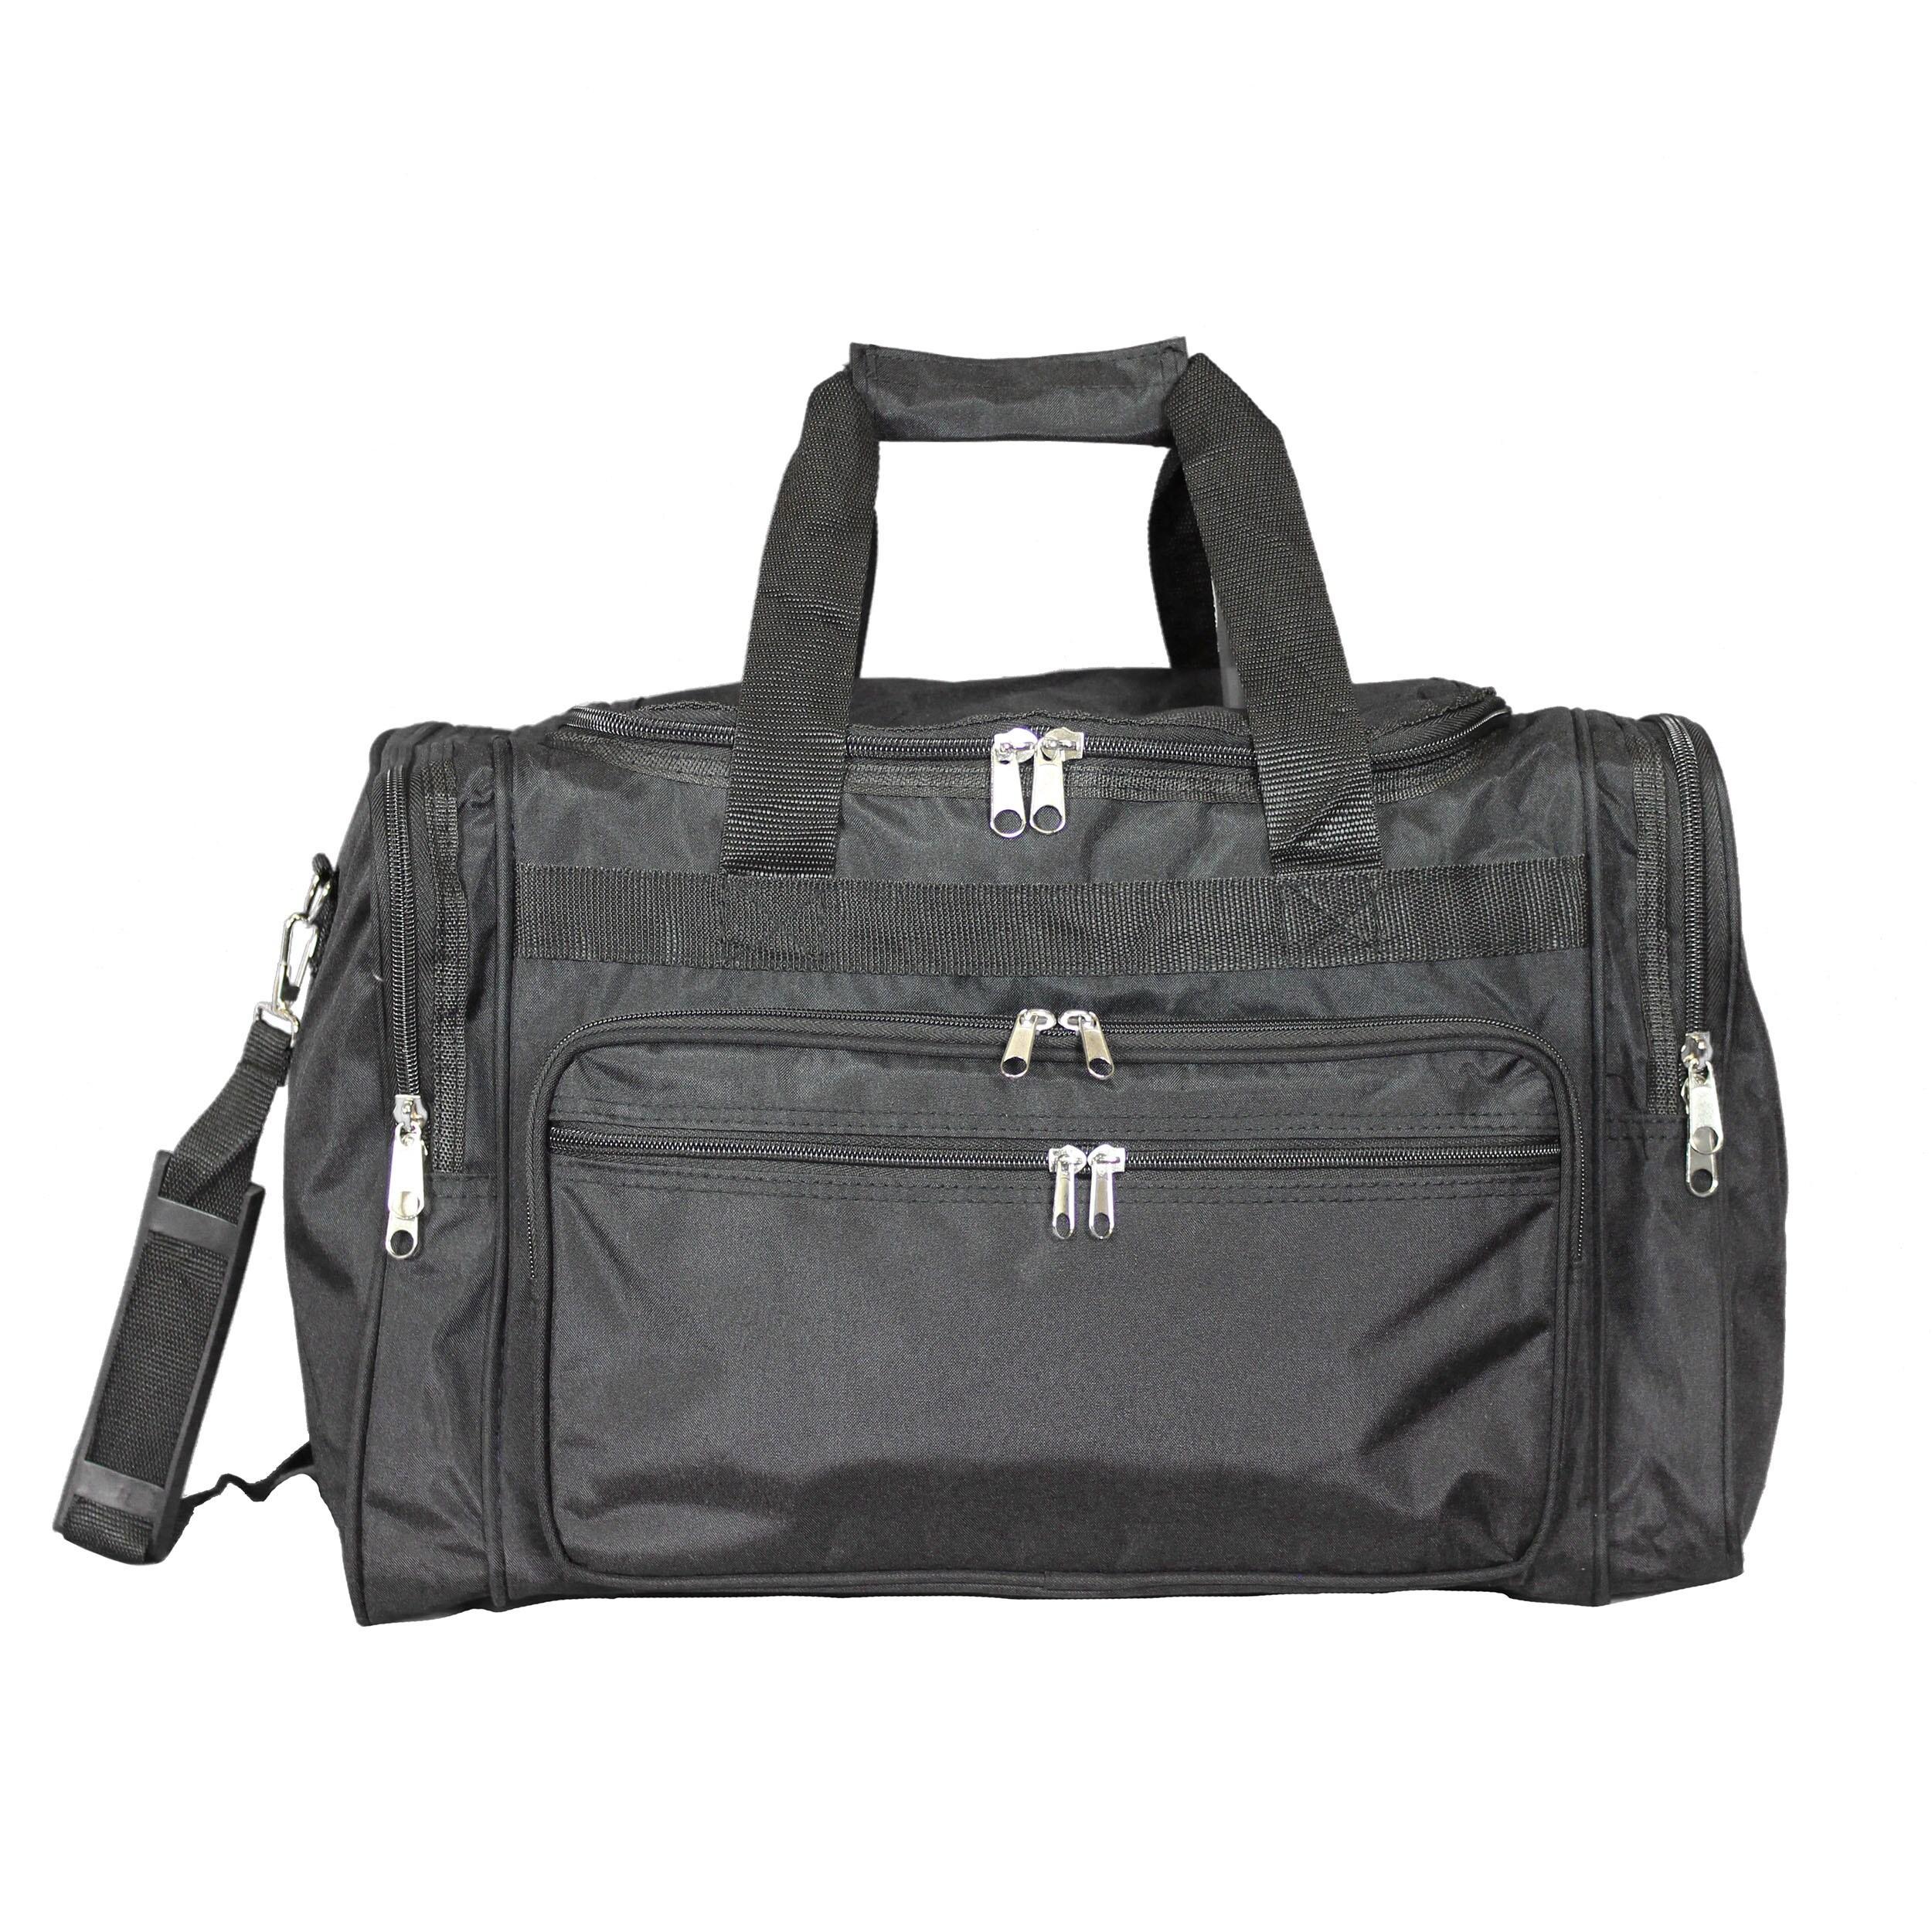 63b7402cbb21 World Traveler Black 16-Inch Lightweight Carry-On Duffle Bag